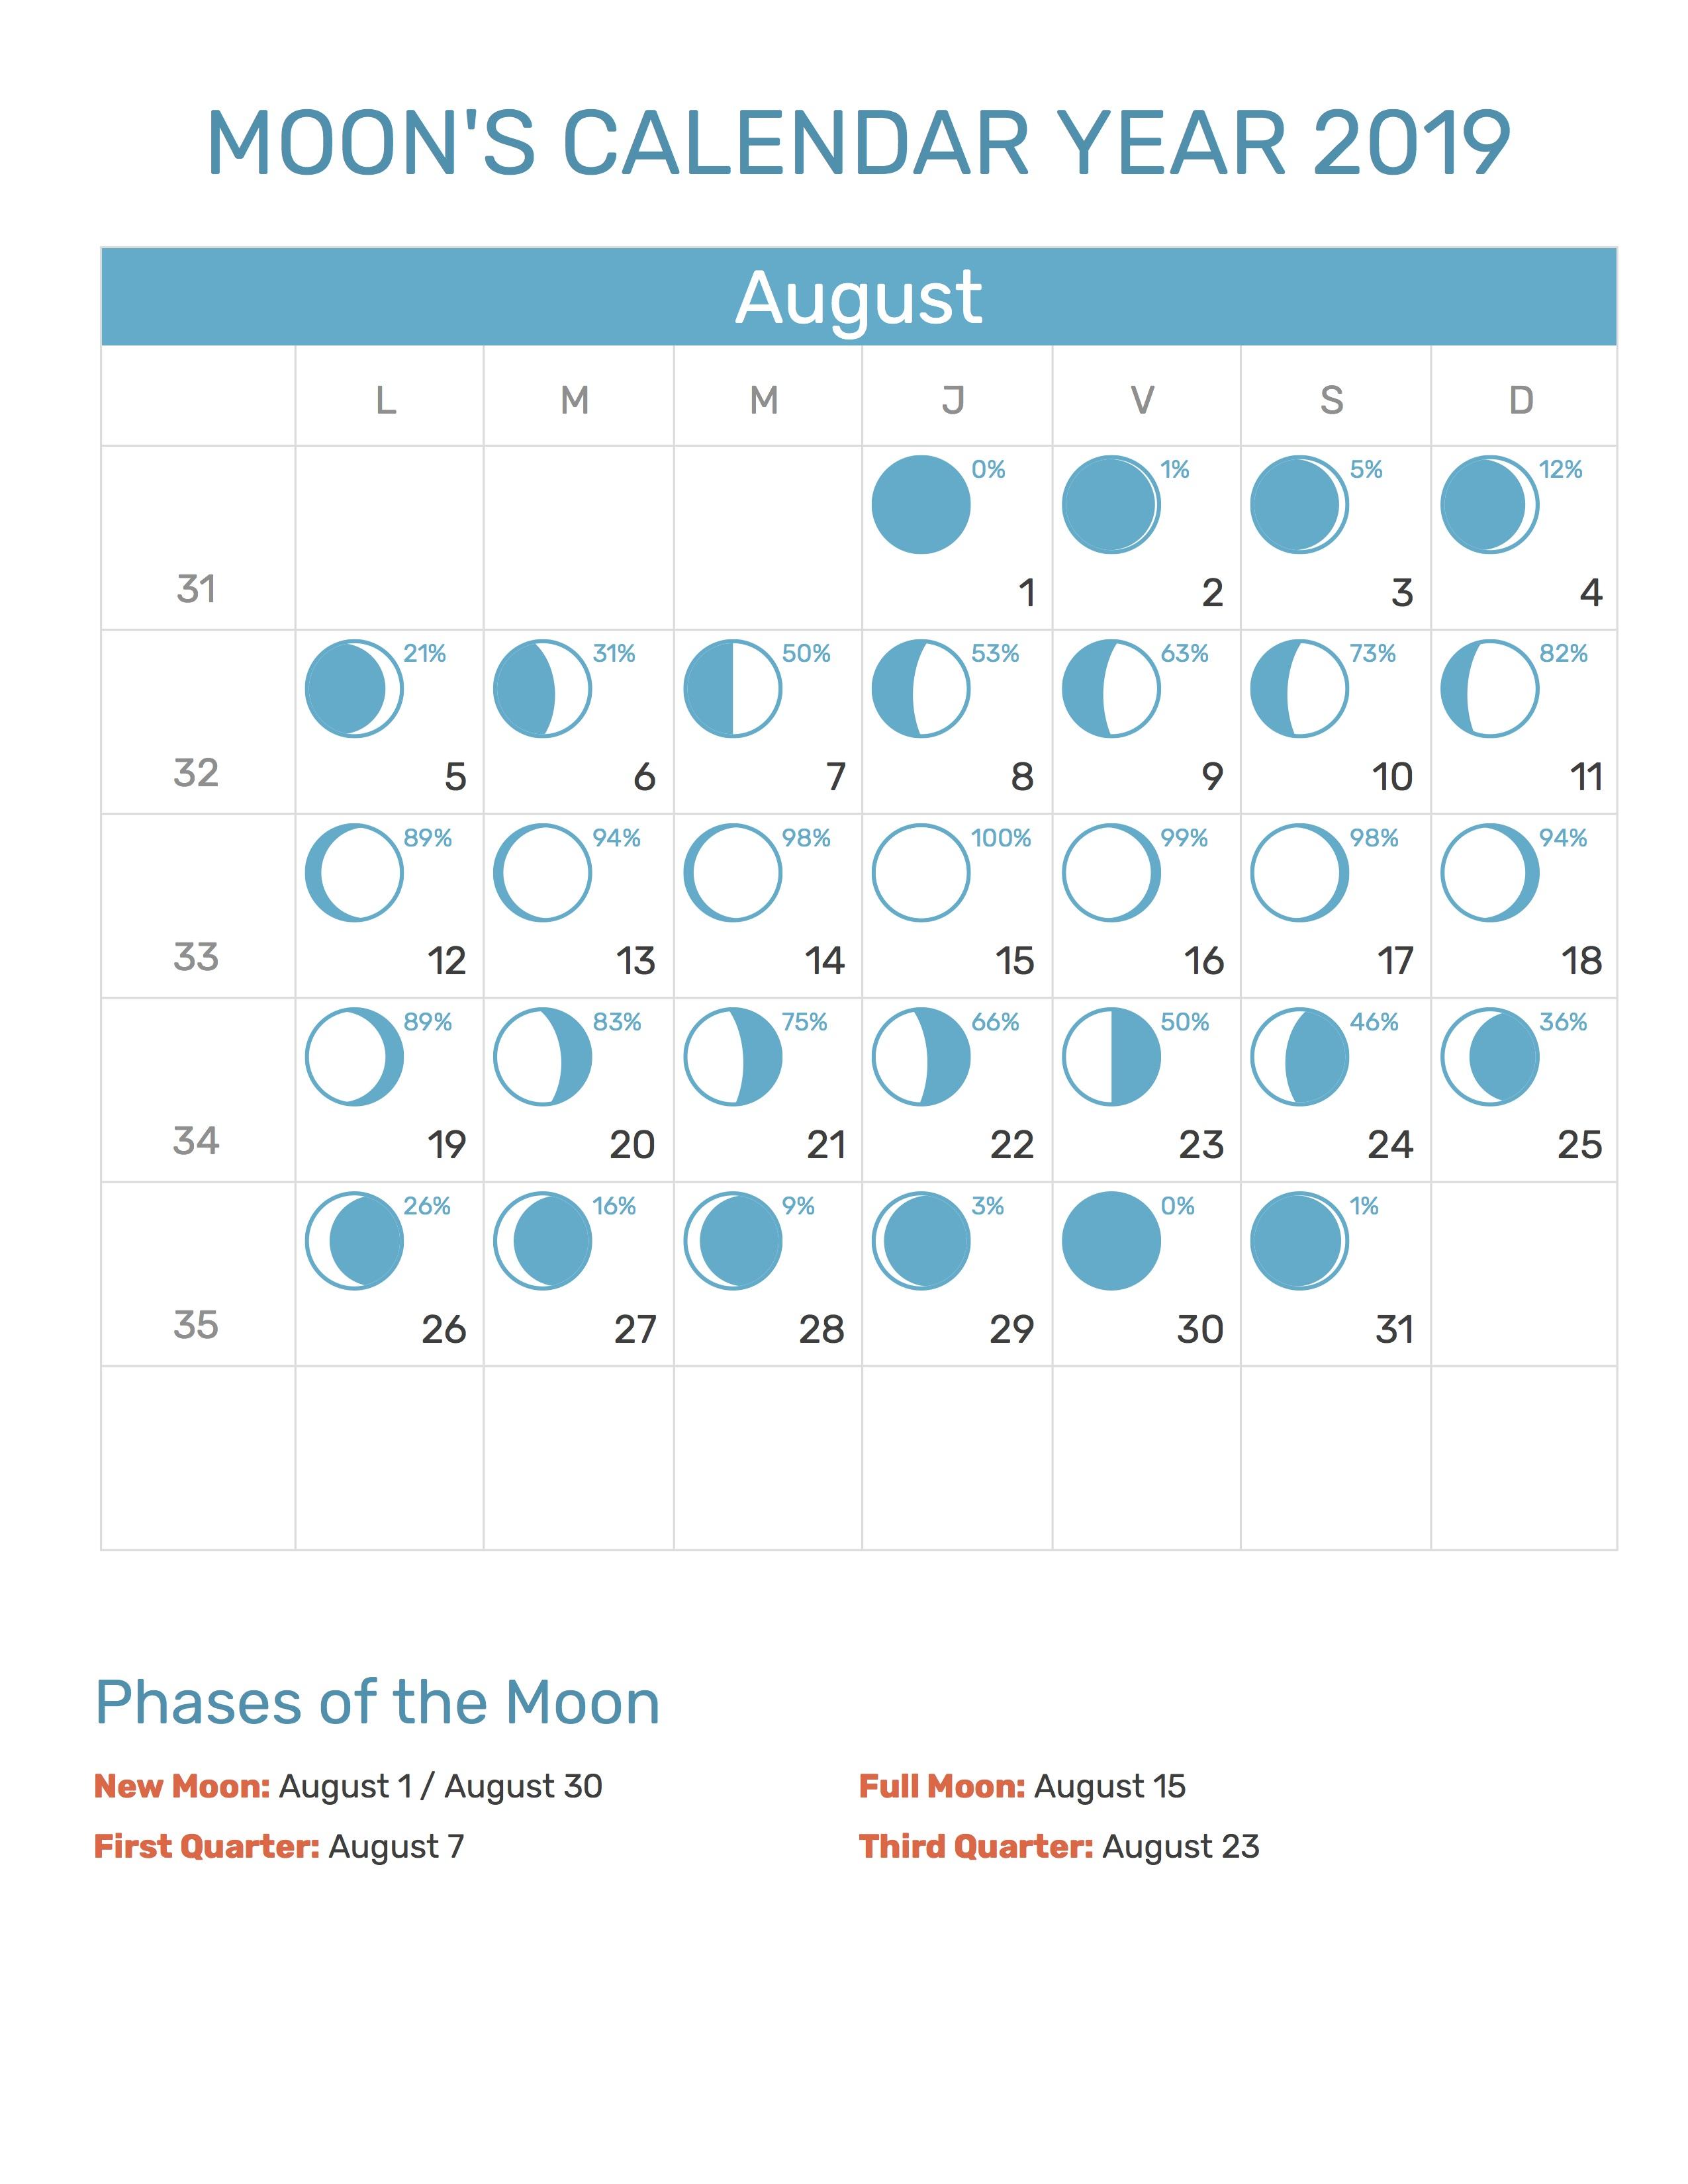 Lunar calendar for August 2019 26